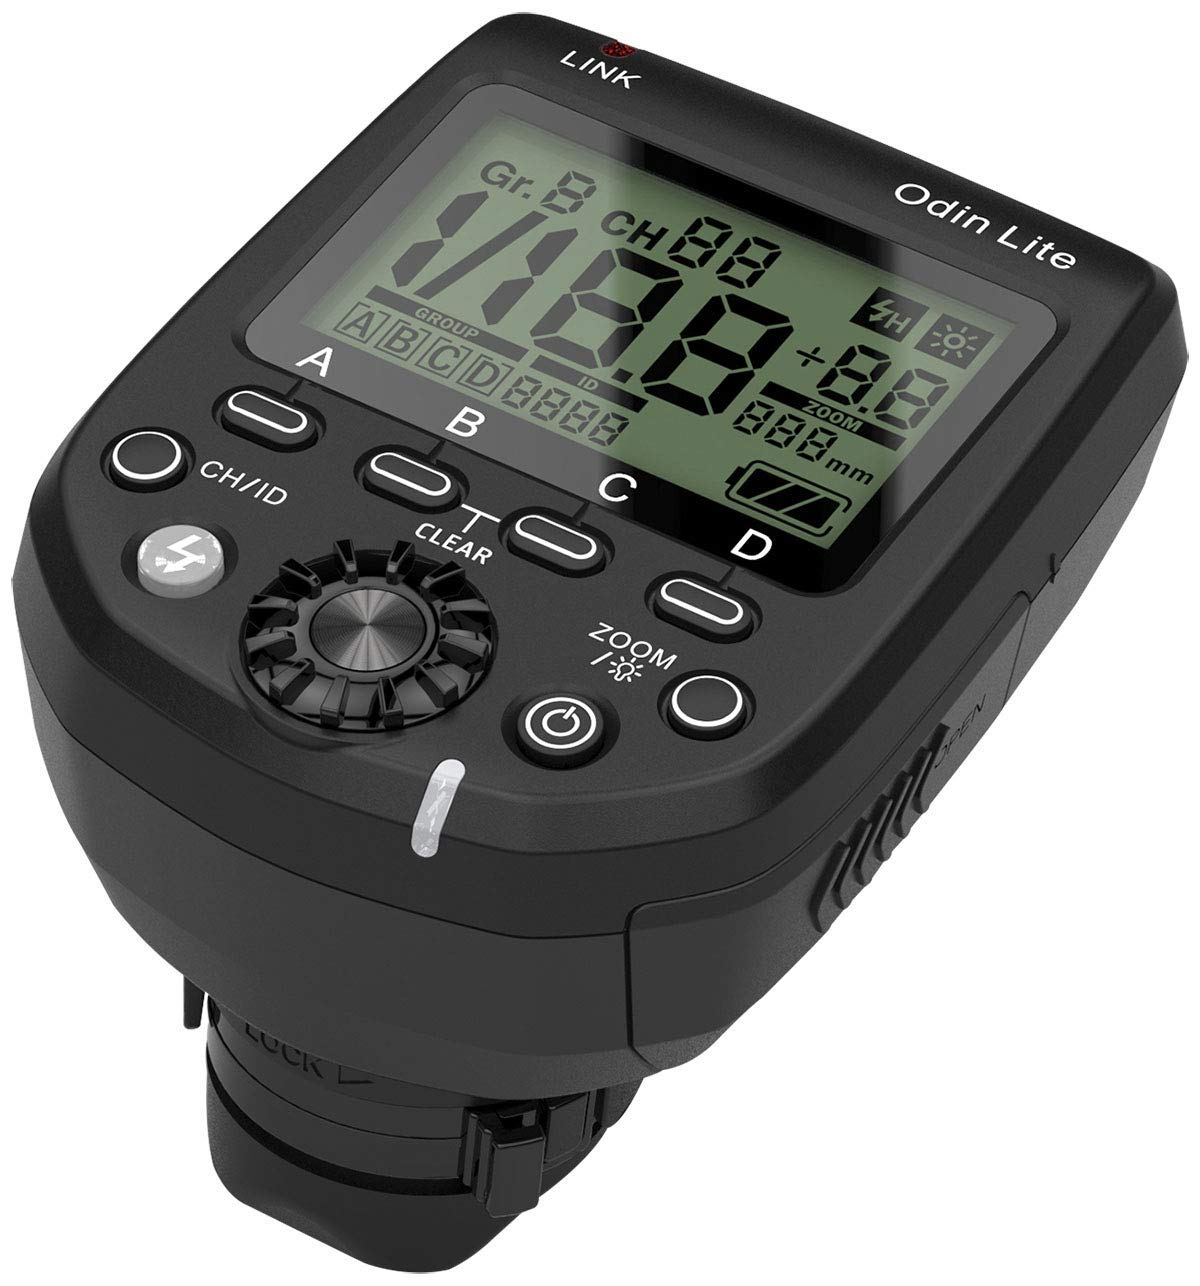 Phottix PH89090 Odin Lite Flash Trigger Transmitter